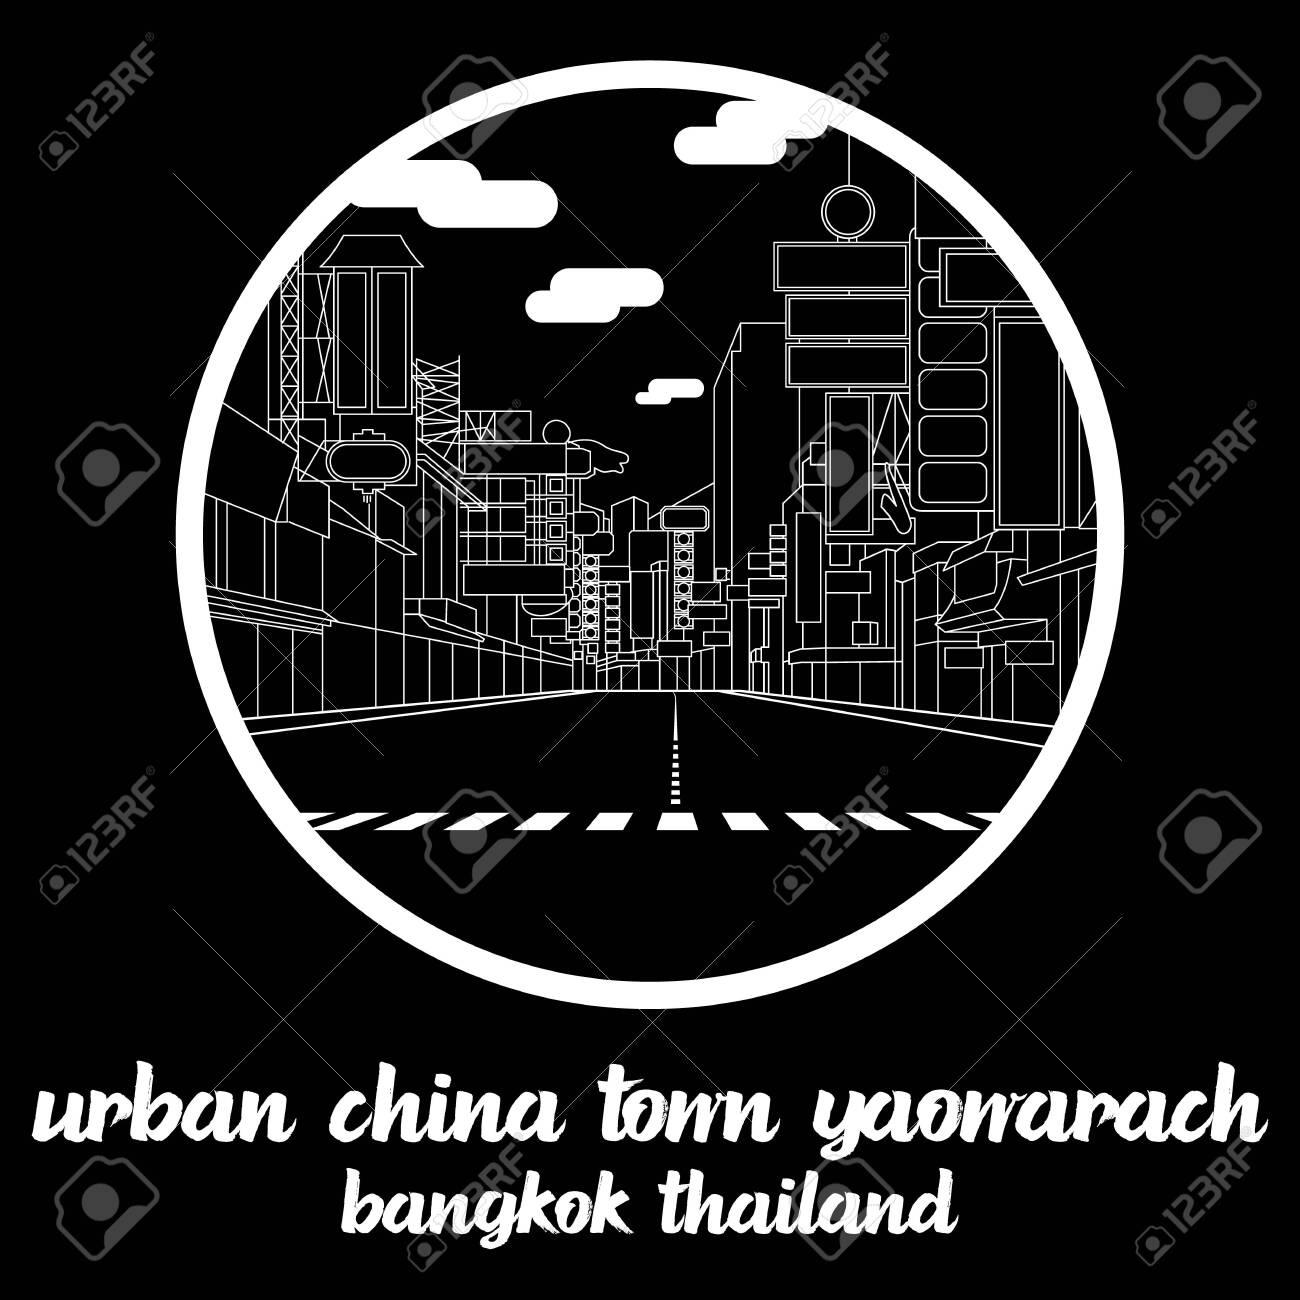 Circle icon line Urban China Town Yaowarach. vector illustration - 133311202